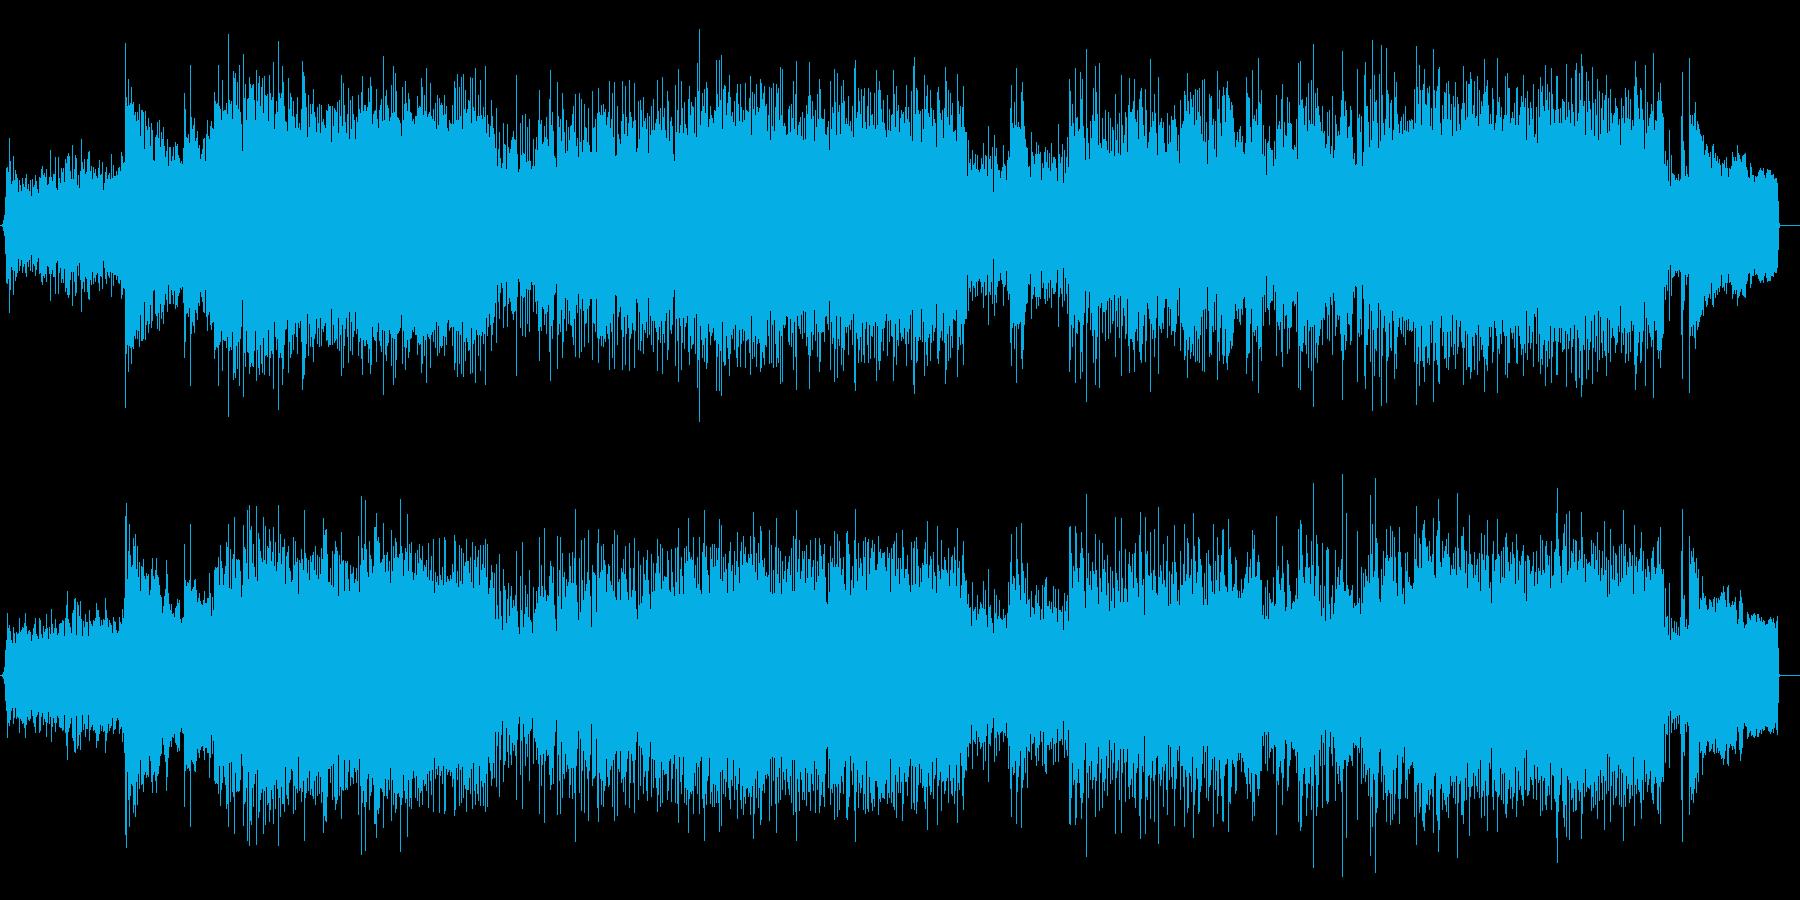 Duelistの再生済みの波形